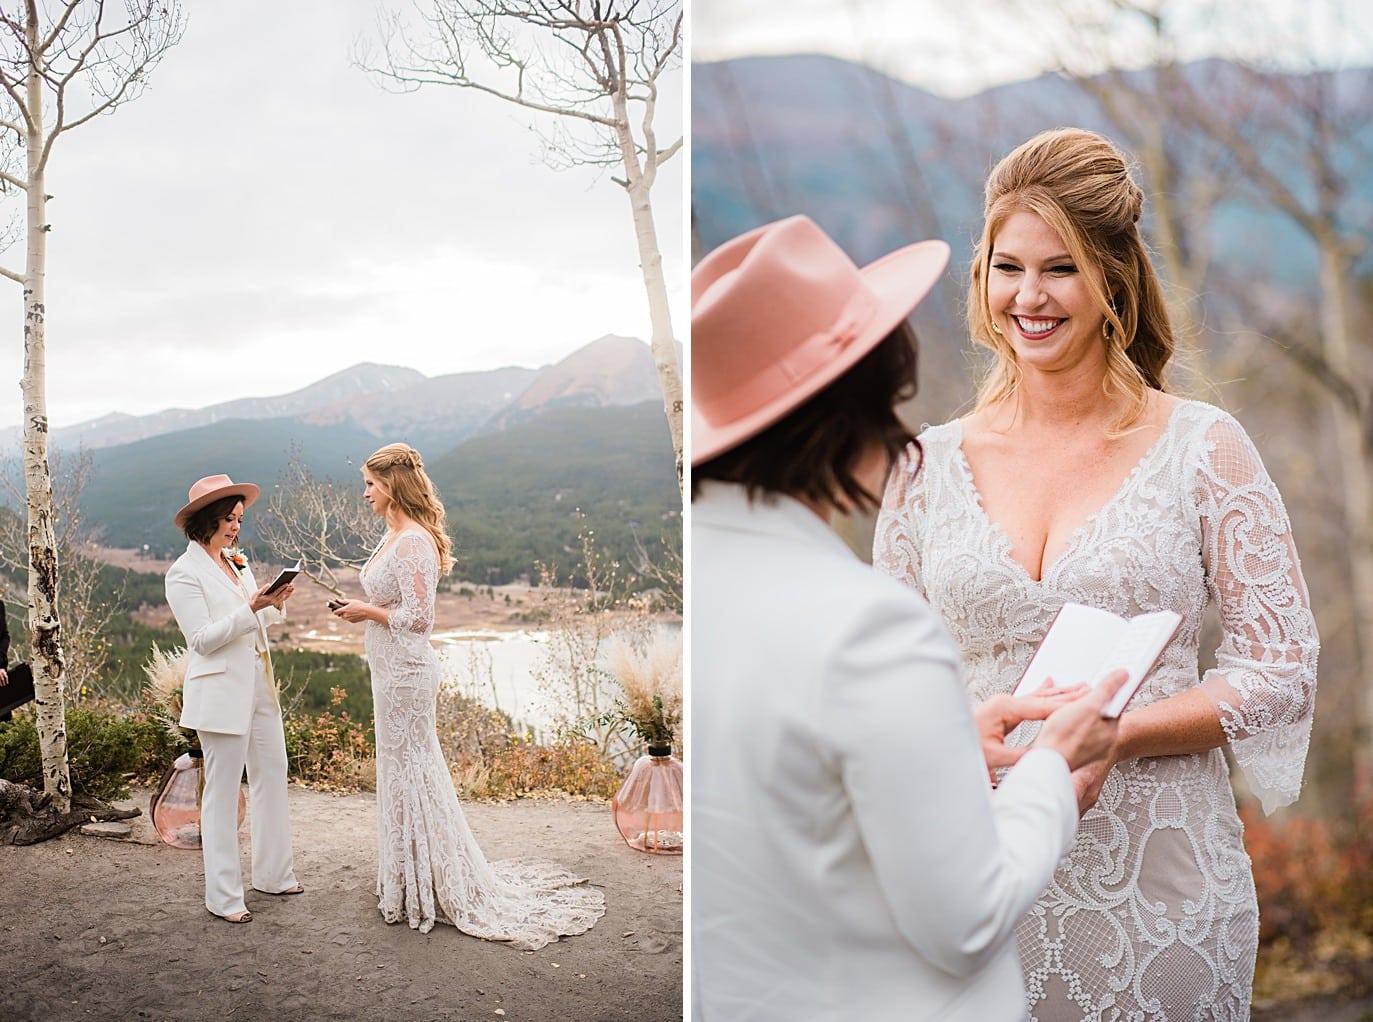 brides exchange vows at Boreas Pass microwedding by Colorado gay wedding photographer Jennie Crate